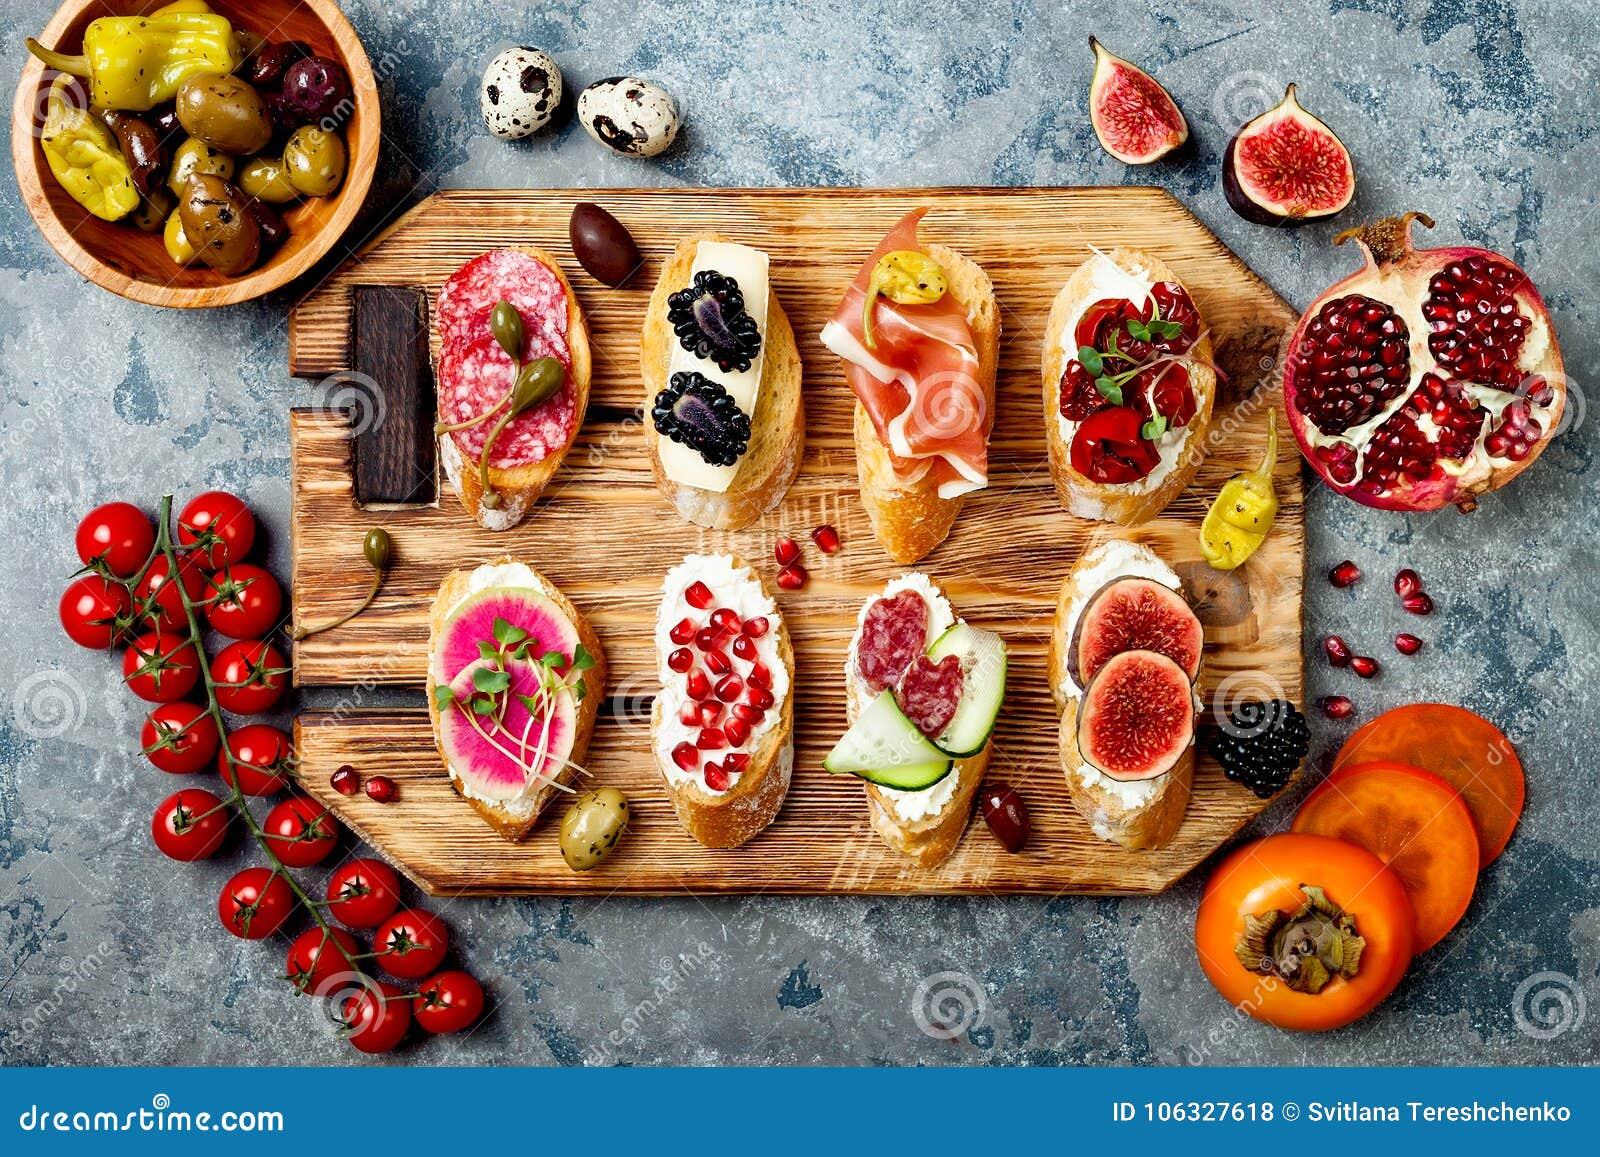 Appetizers table with italian antipasti snacks. Brushetta or authentic traditional spanish tapas set